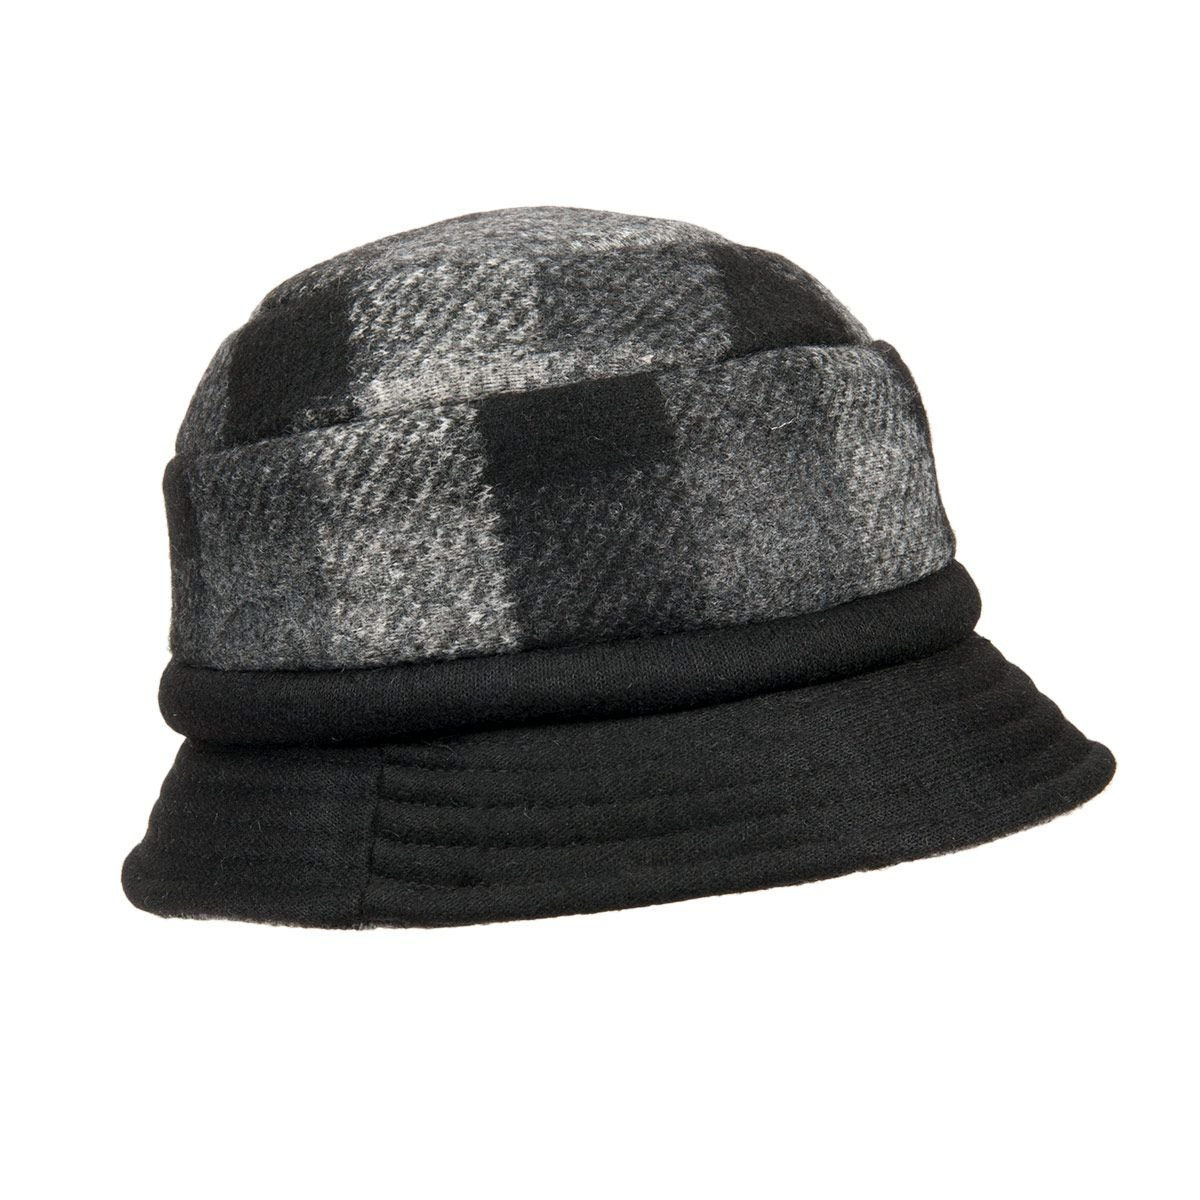 one size flapper fabric hat 27b2cc45269